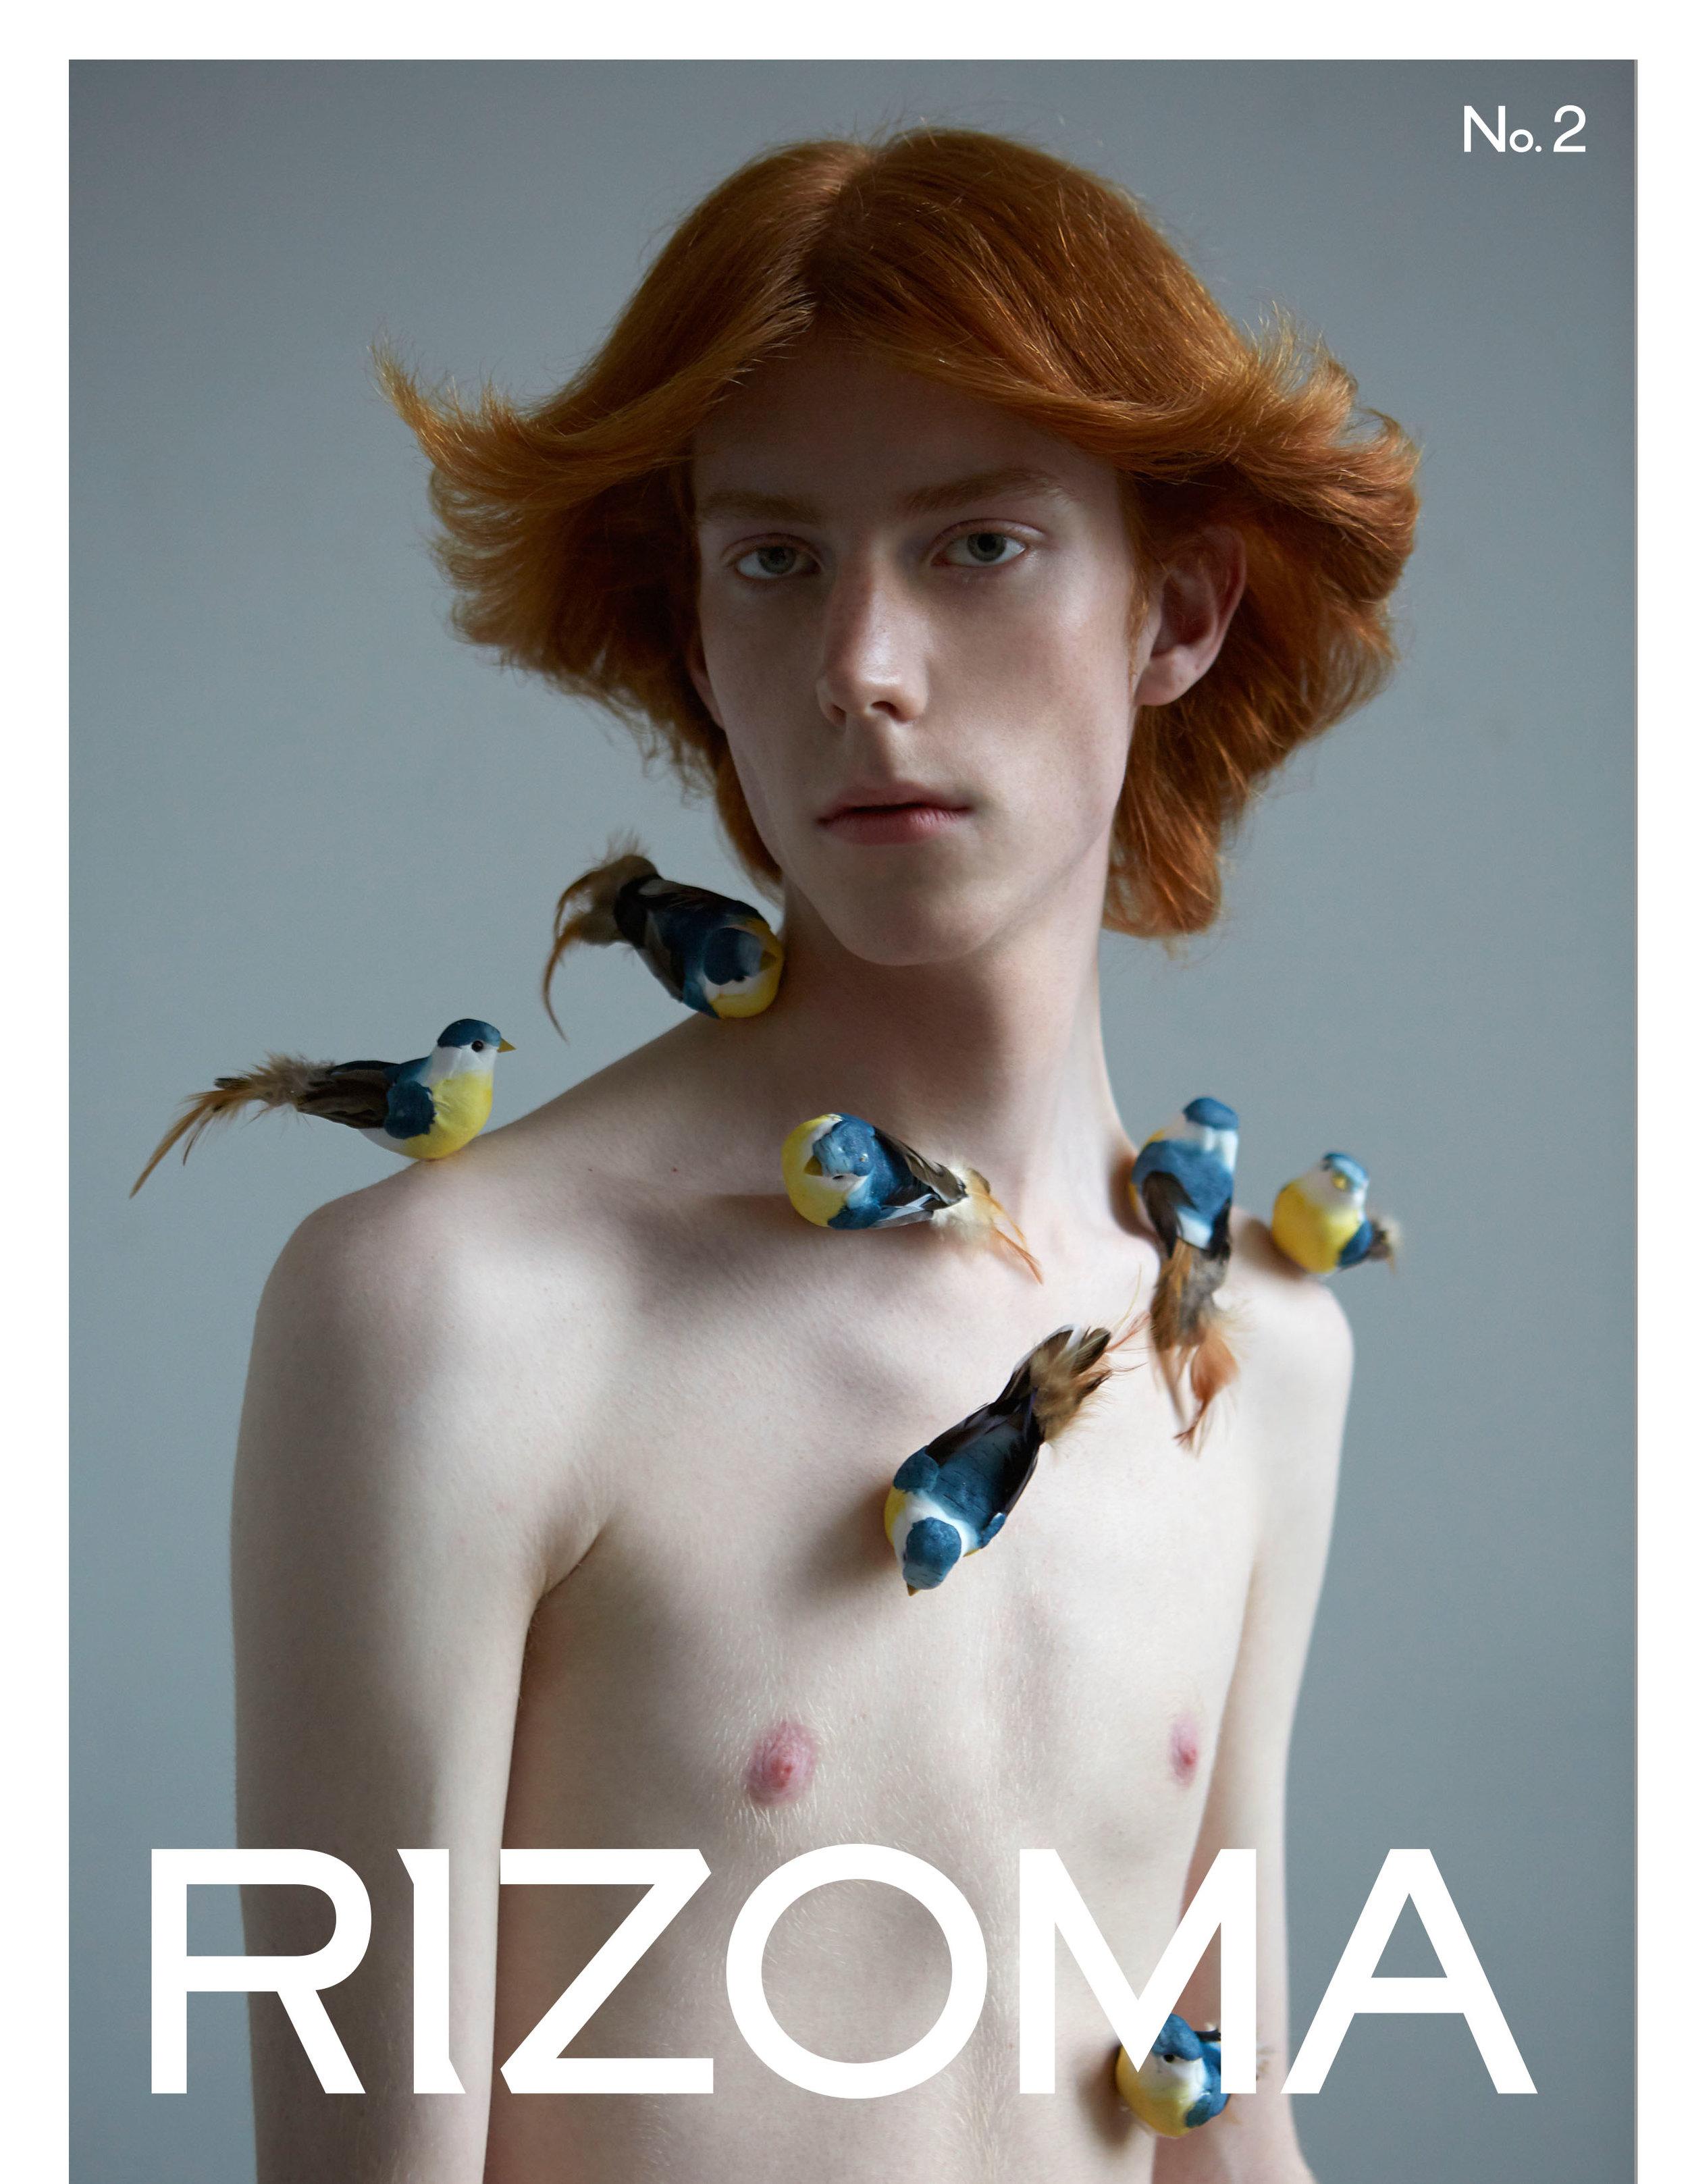 2RHIZOME-COVER-TEMPLATE.jpg